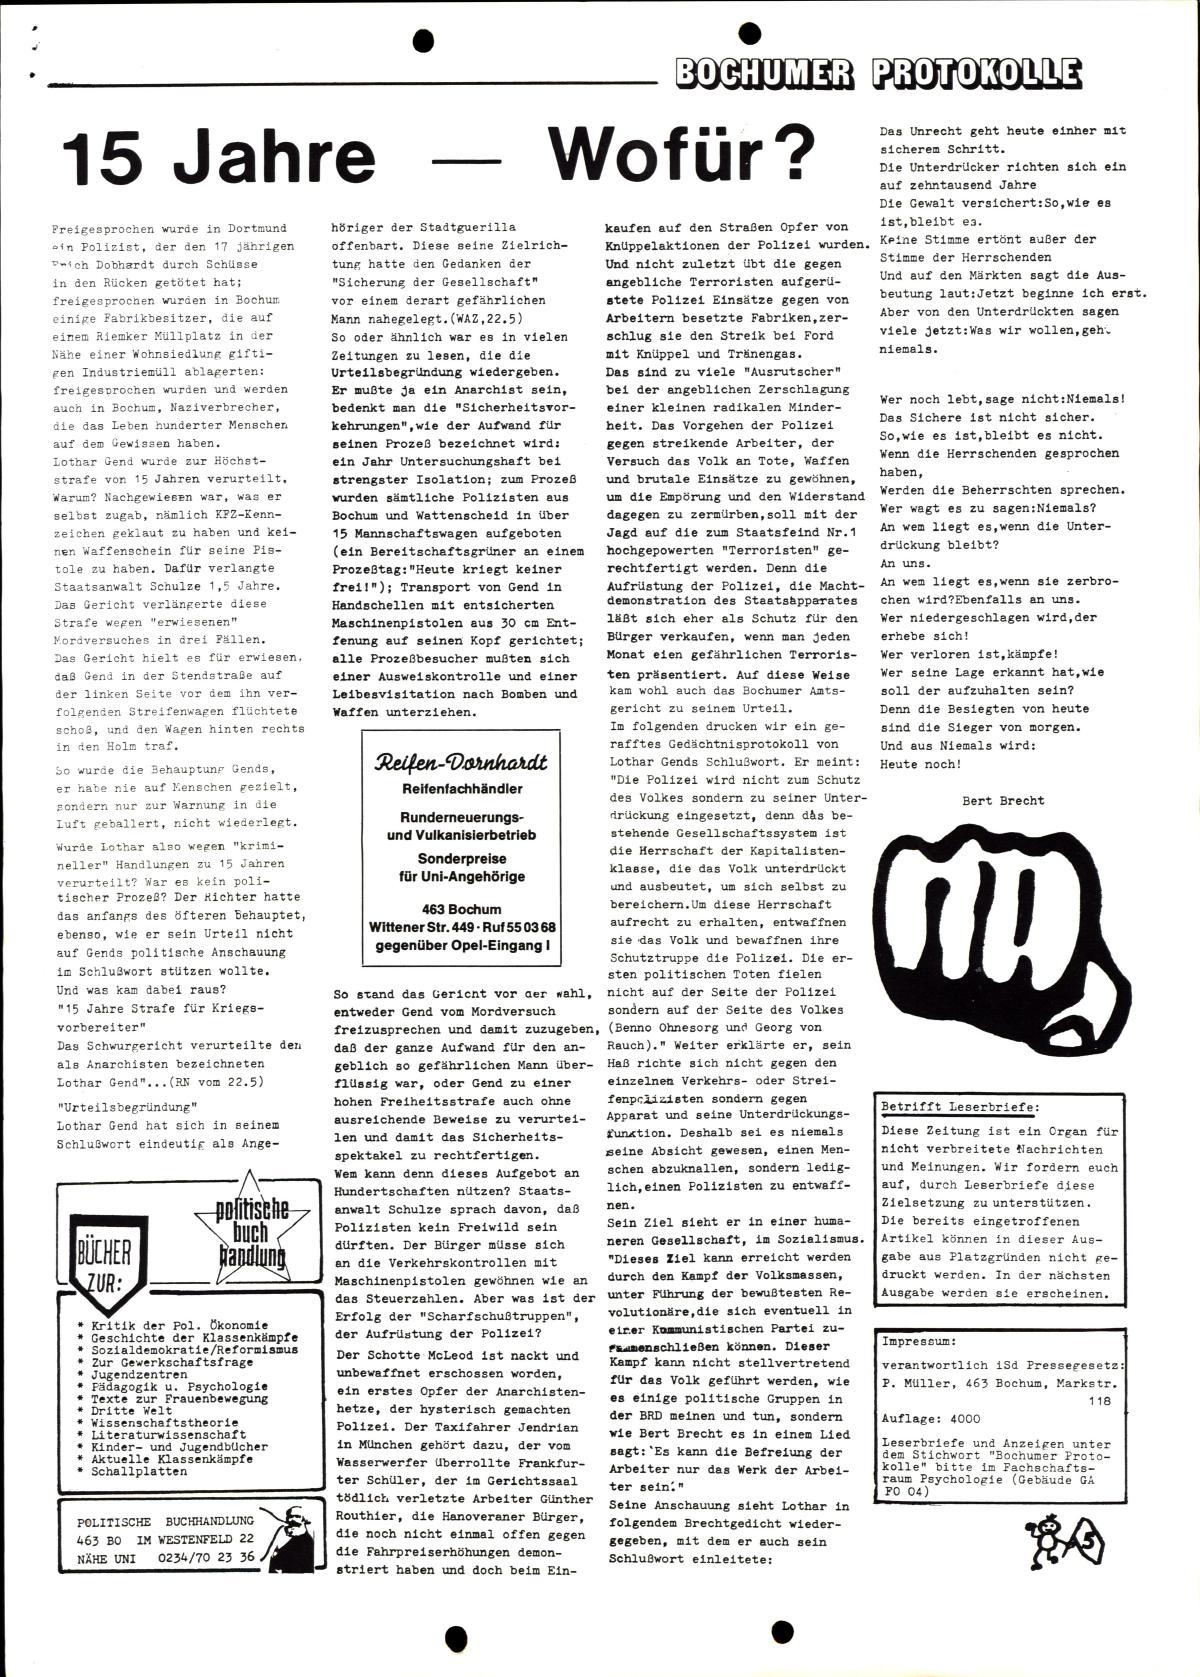 Bochumer_Protokolle_19750500_005